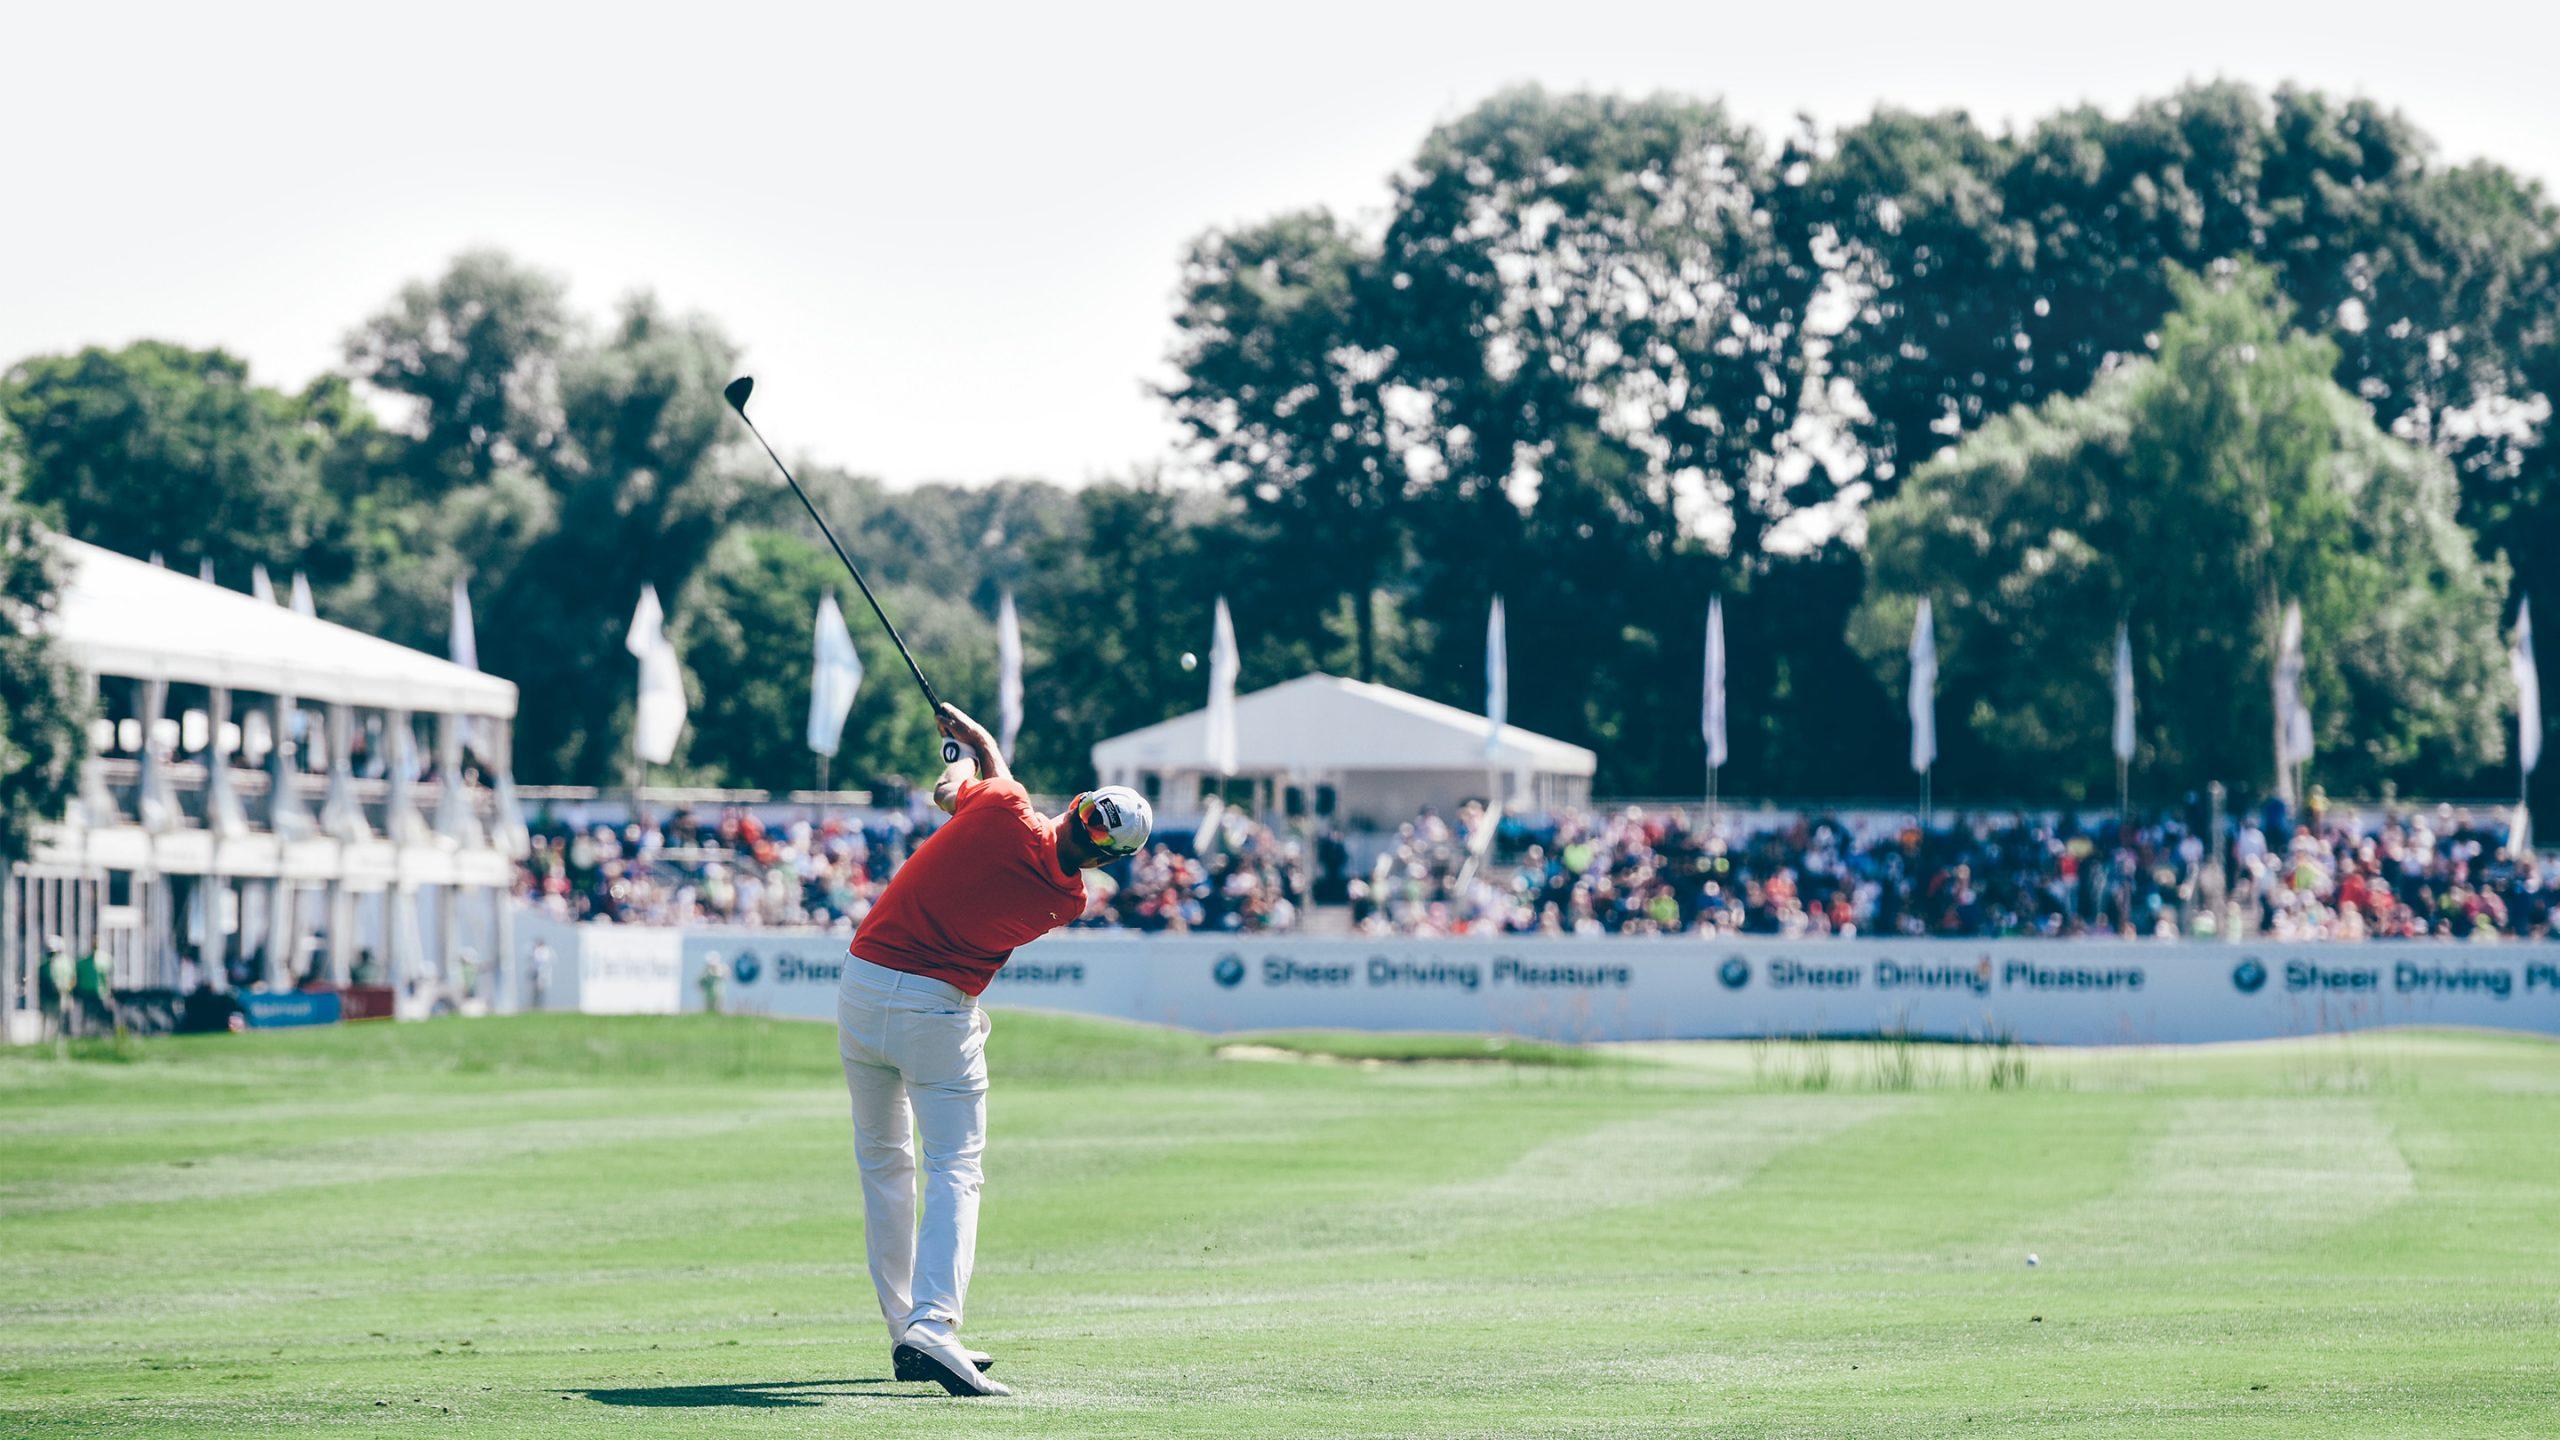 pascher-heinz-bmw-golfsport-footer-image